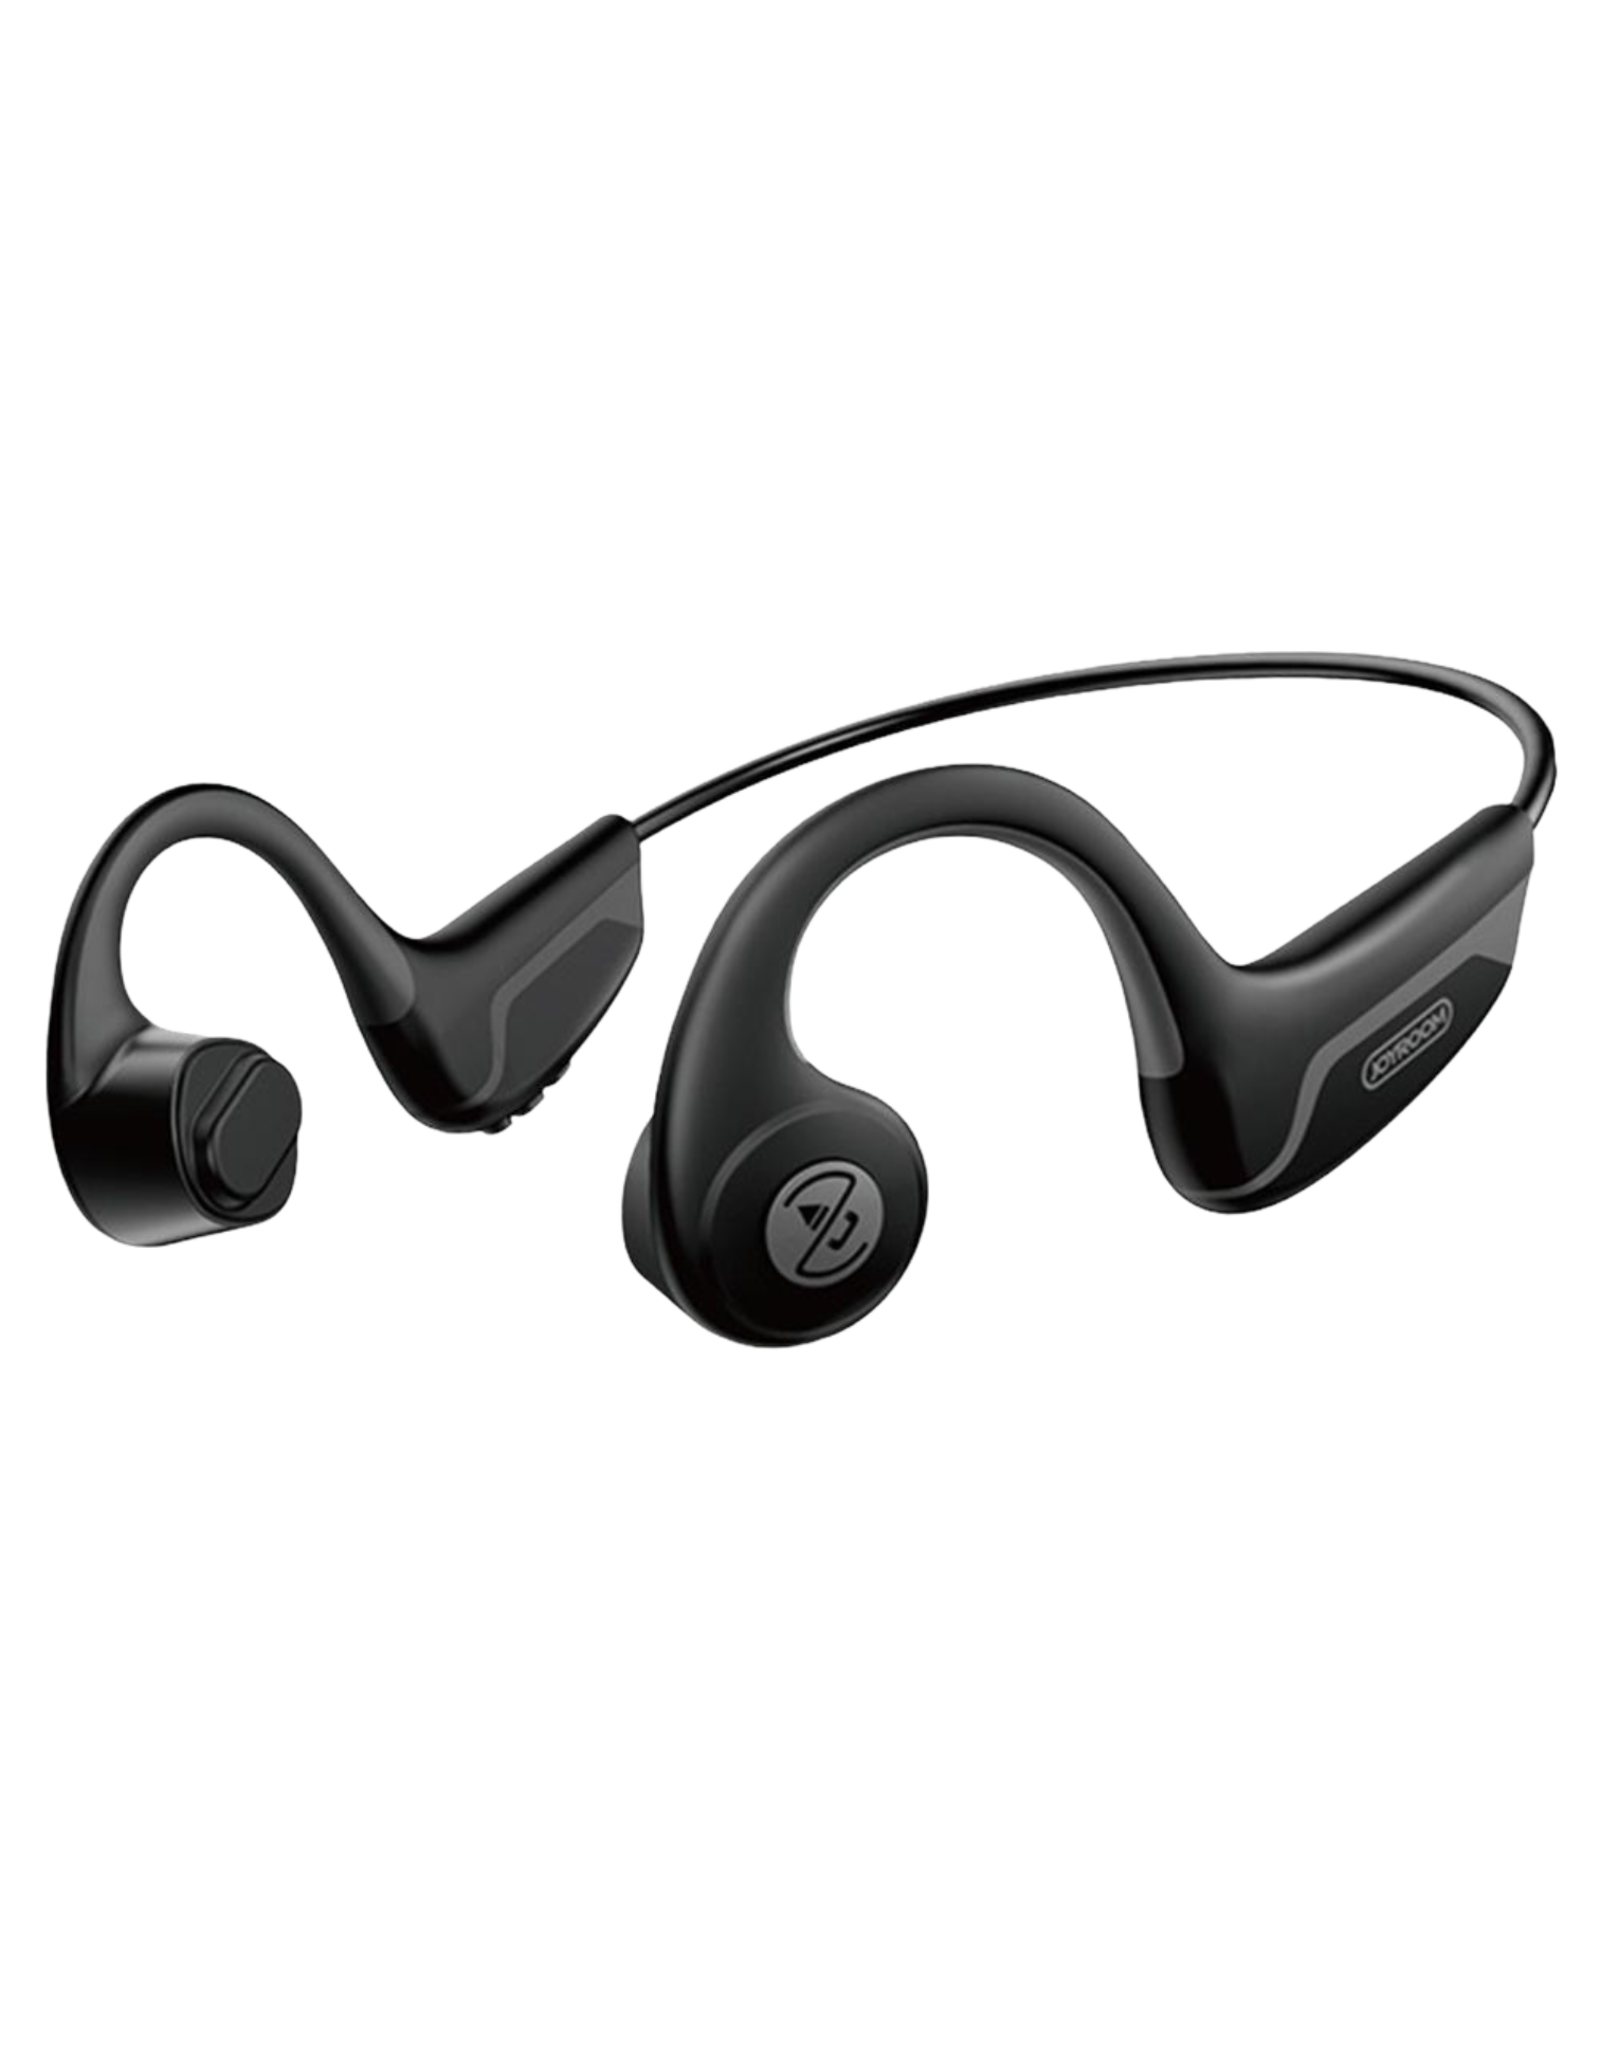 Joyroom JOYROOM JR-G1 36g Bluetooth 5.0 Earphones Bone Conduction